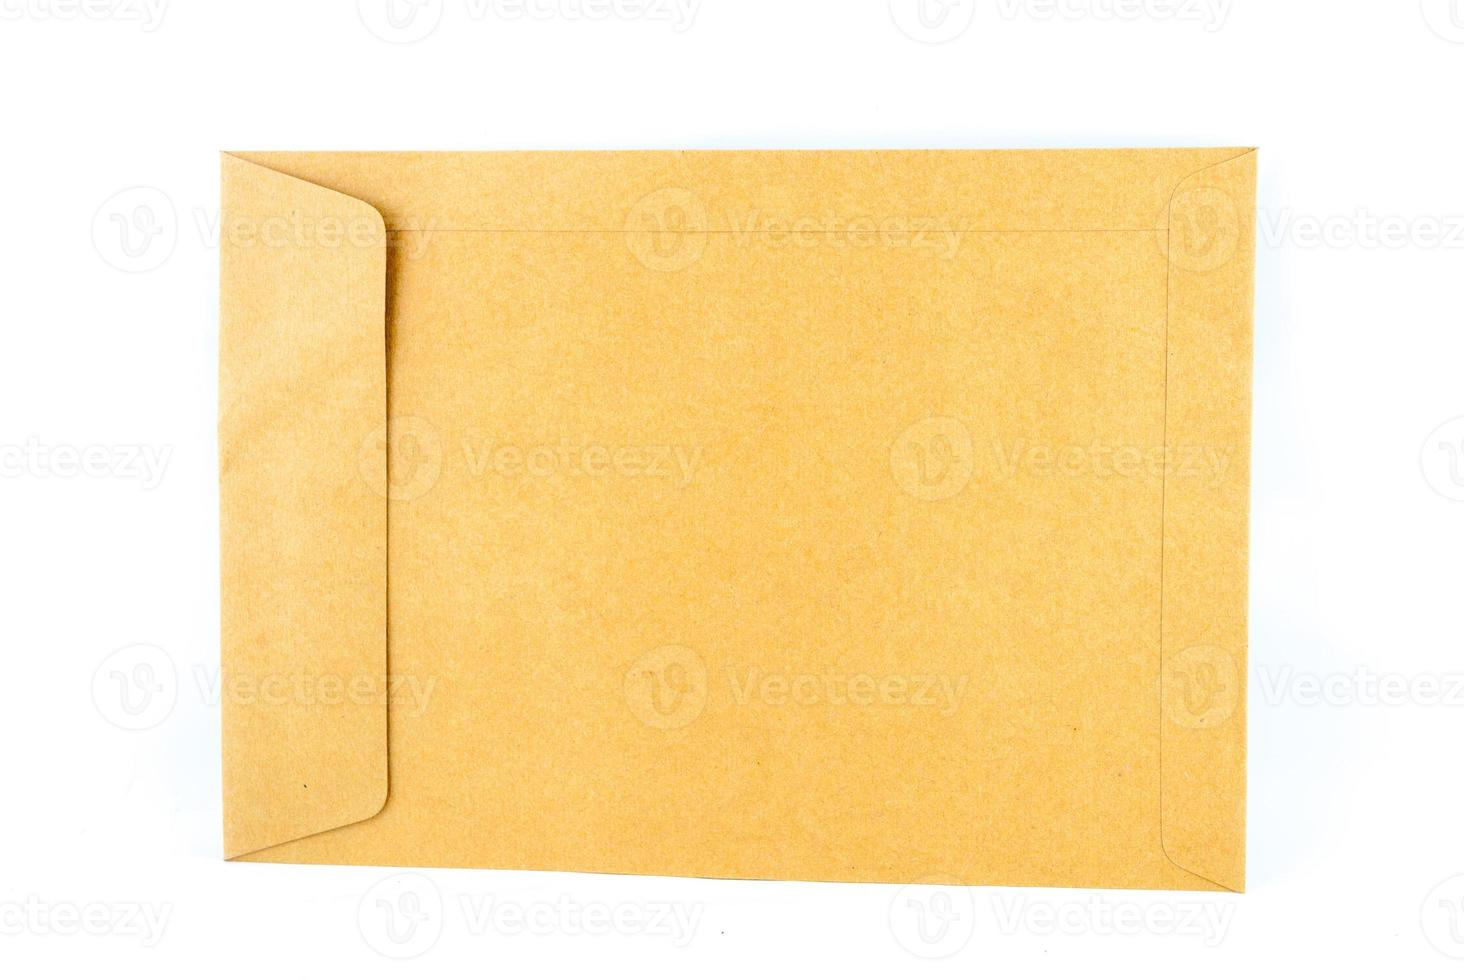 documento envelope marrom foto